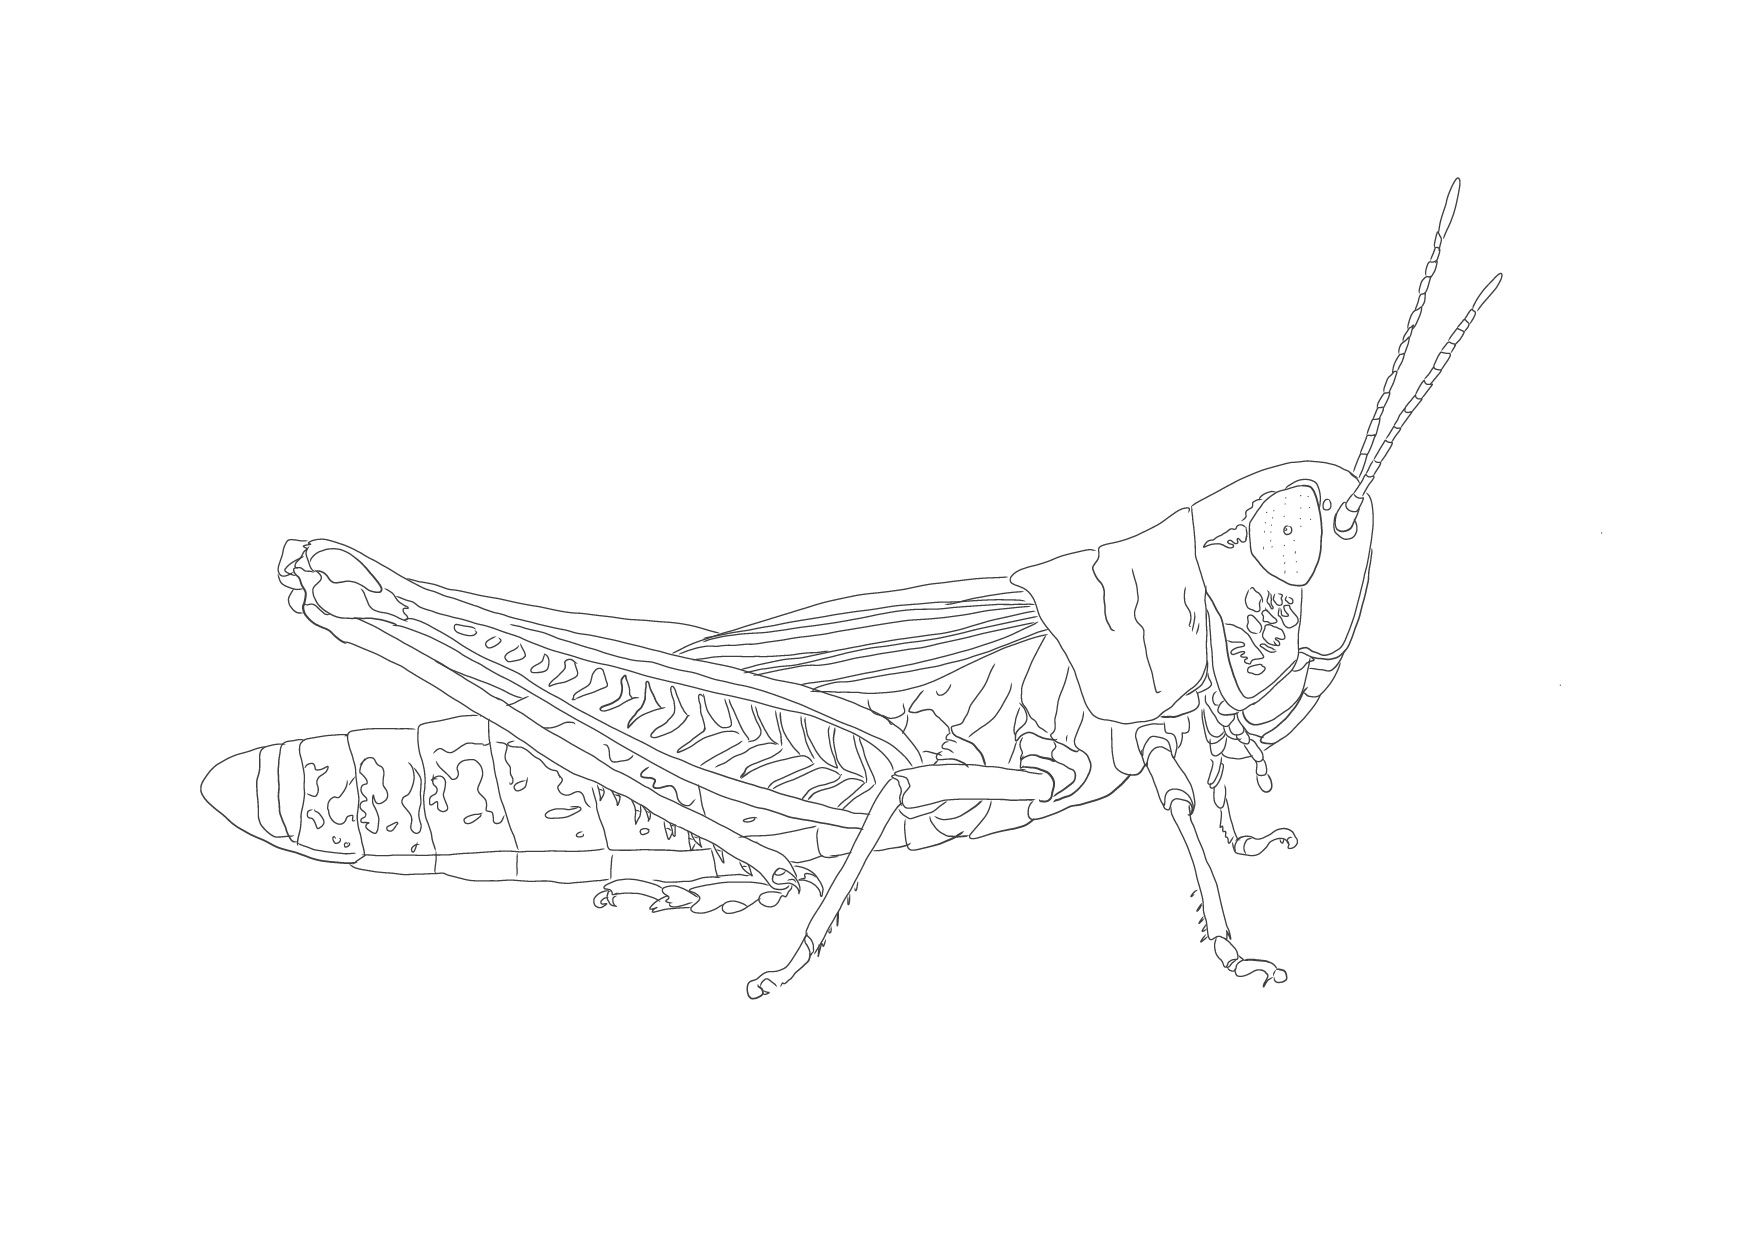 malmal grashüpfer  malvorlagen  malvorlagen malvorlagen